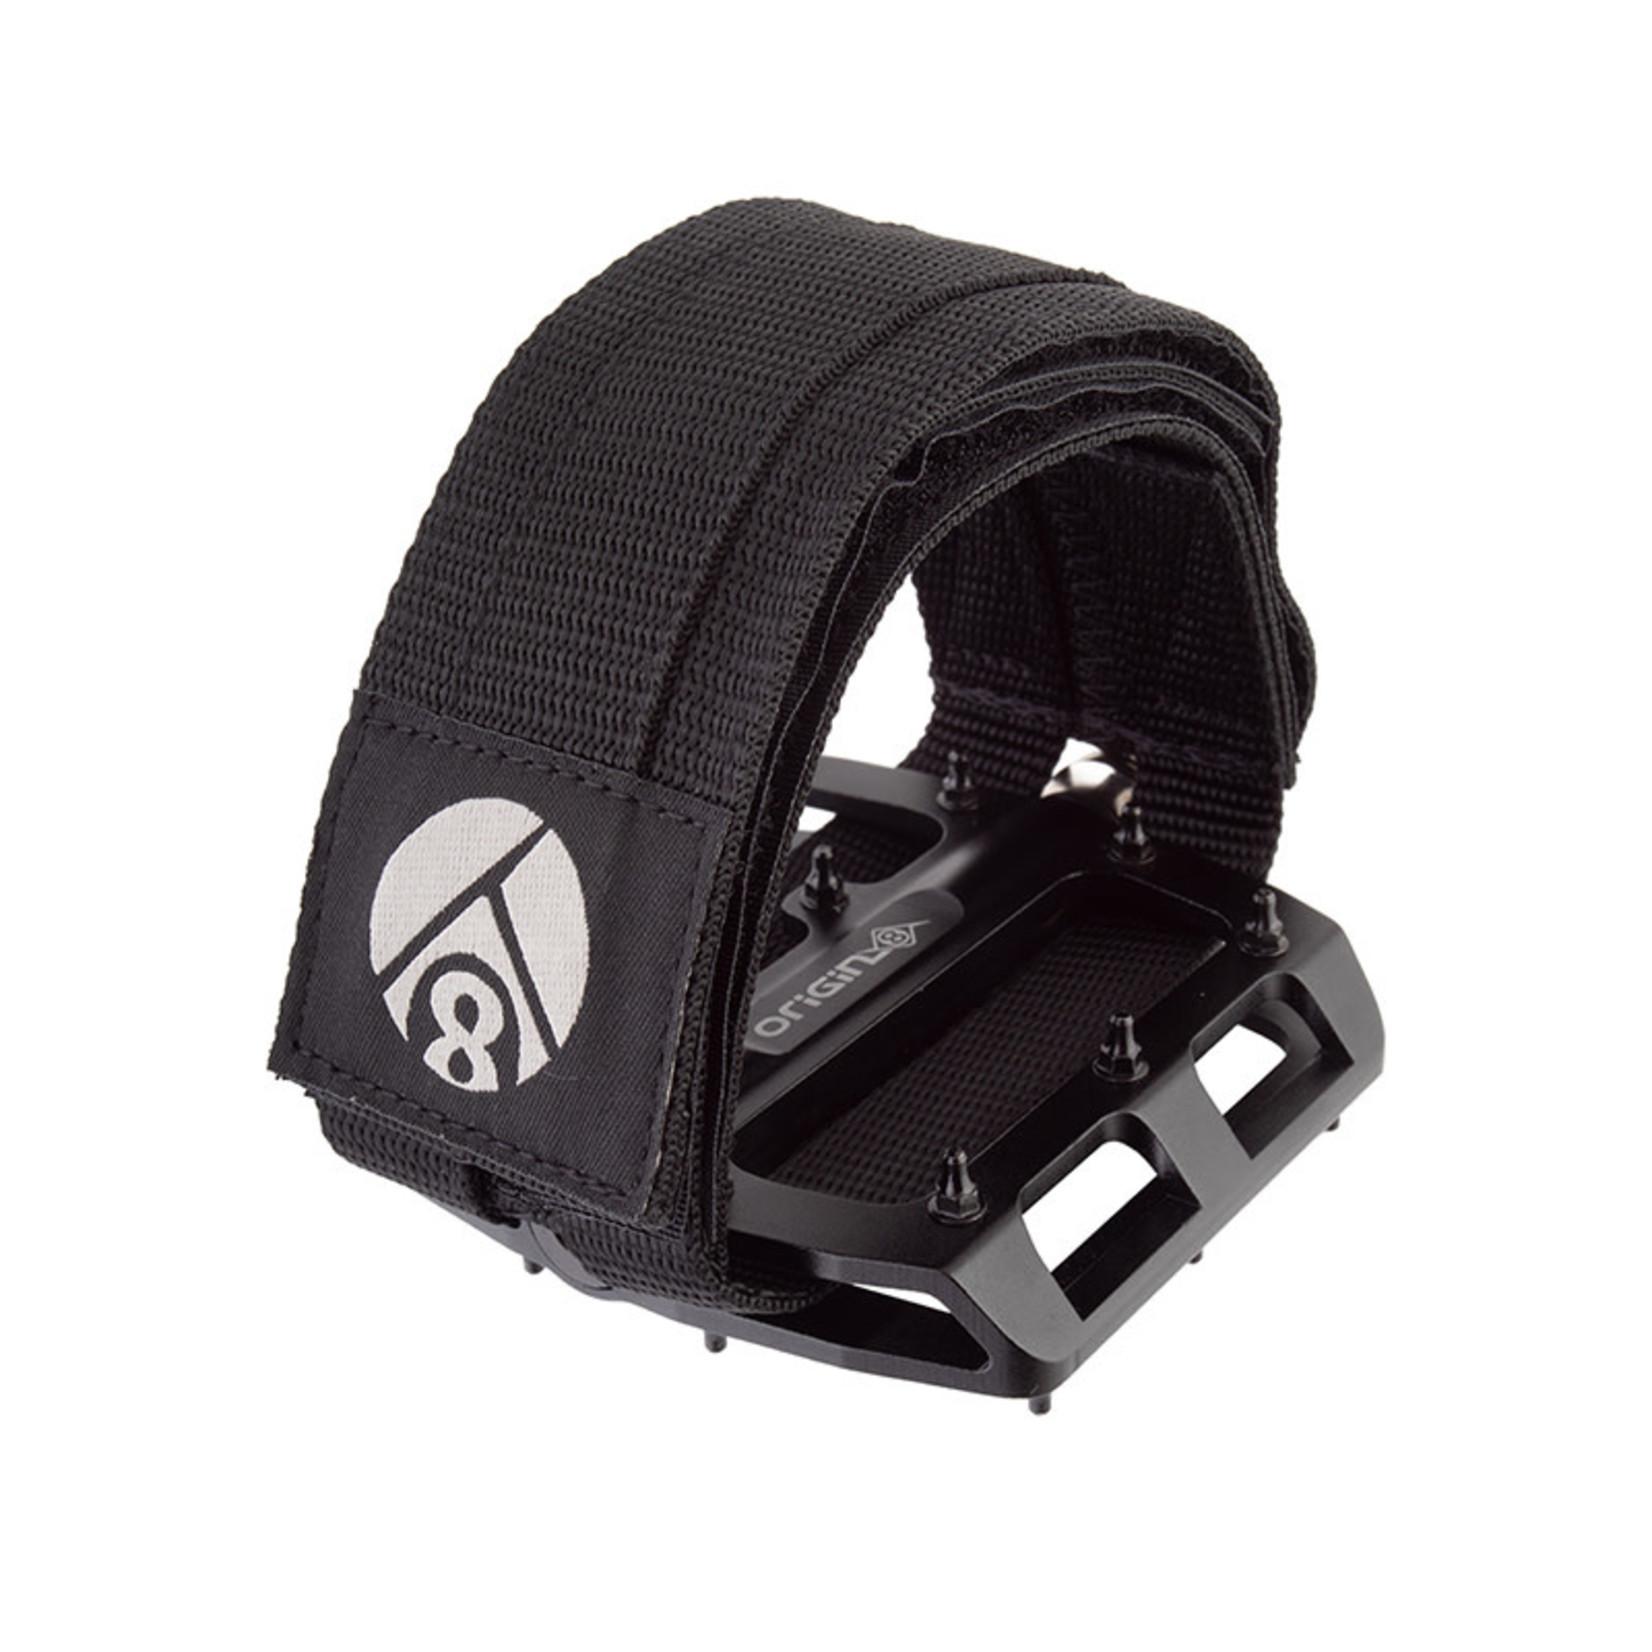 Toe Straps Pro Grip II Black